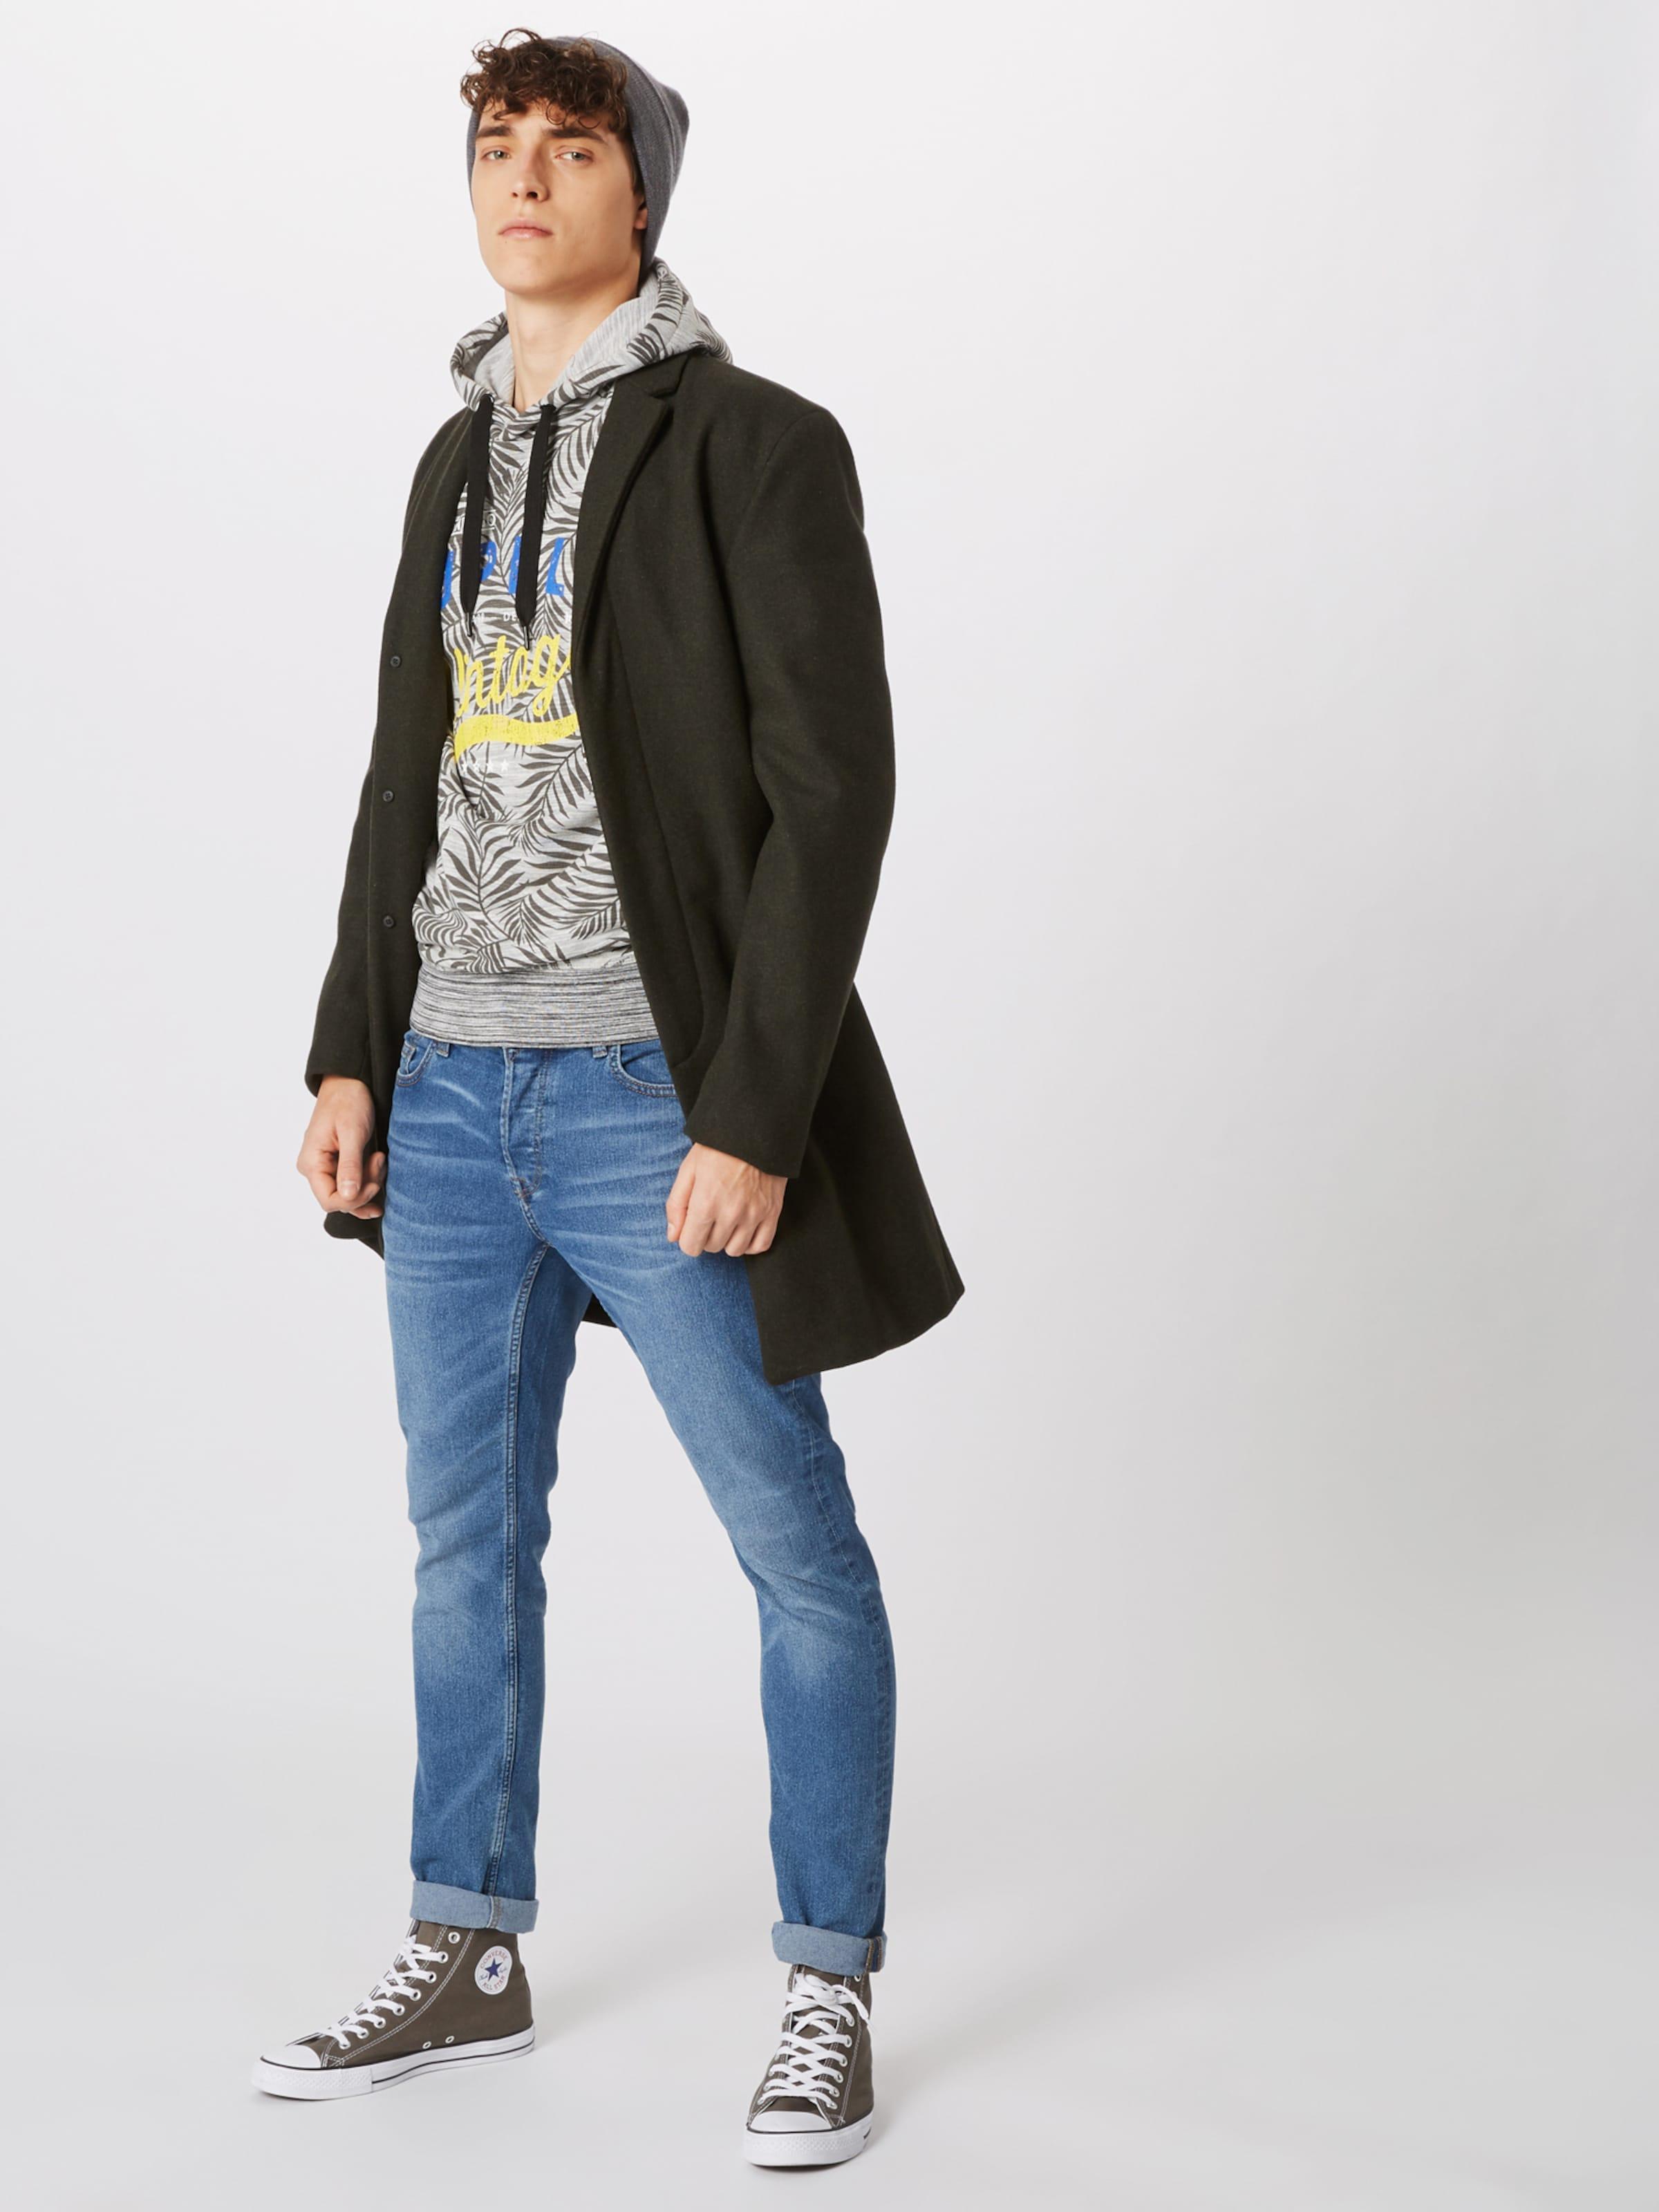 Schwarz Sweatshirt solid 'sweatBelton' In NeongelbGrau USVpzM